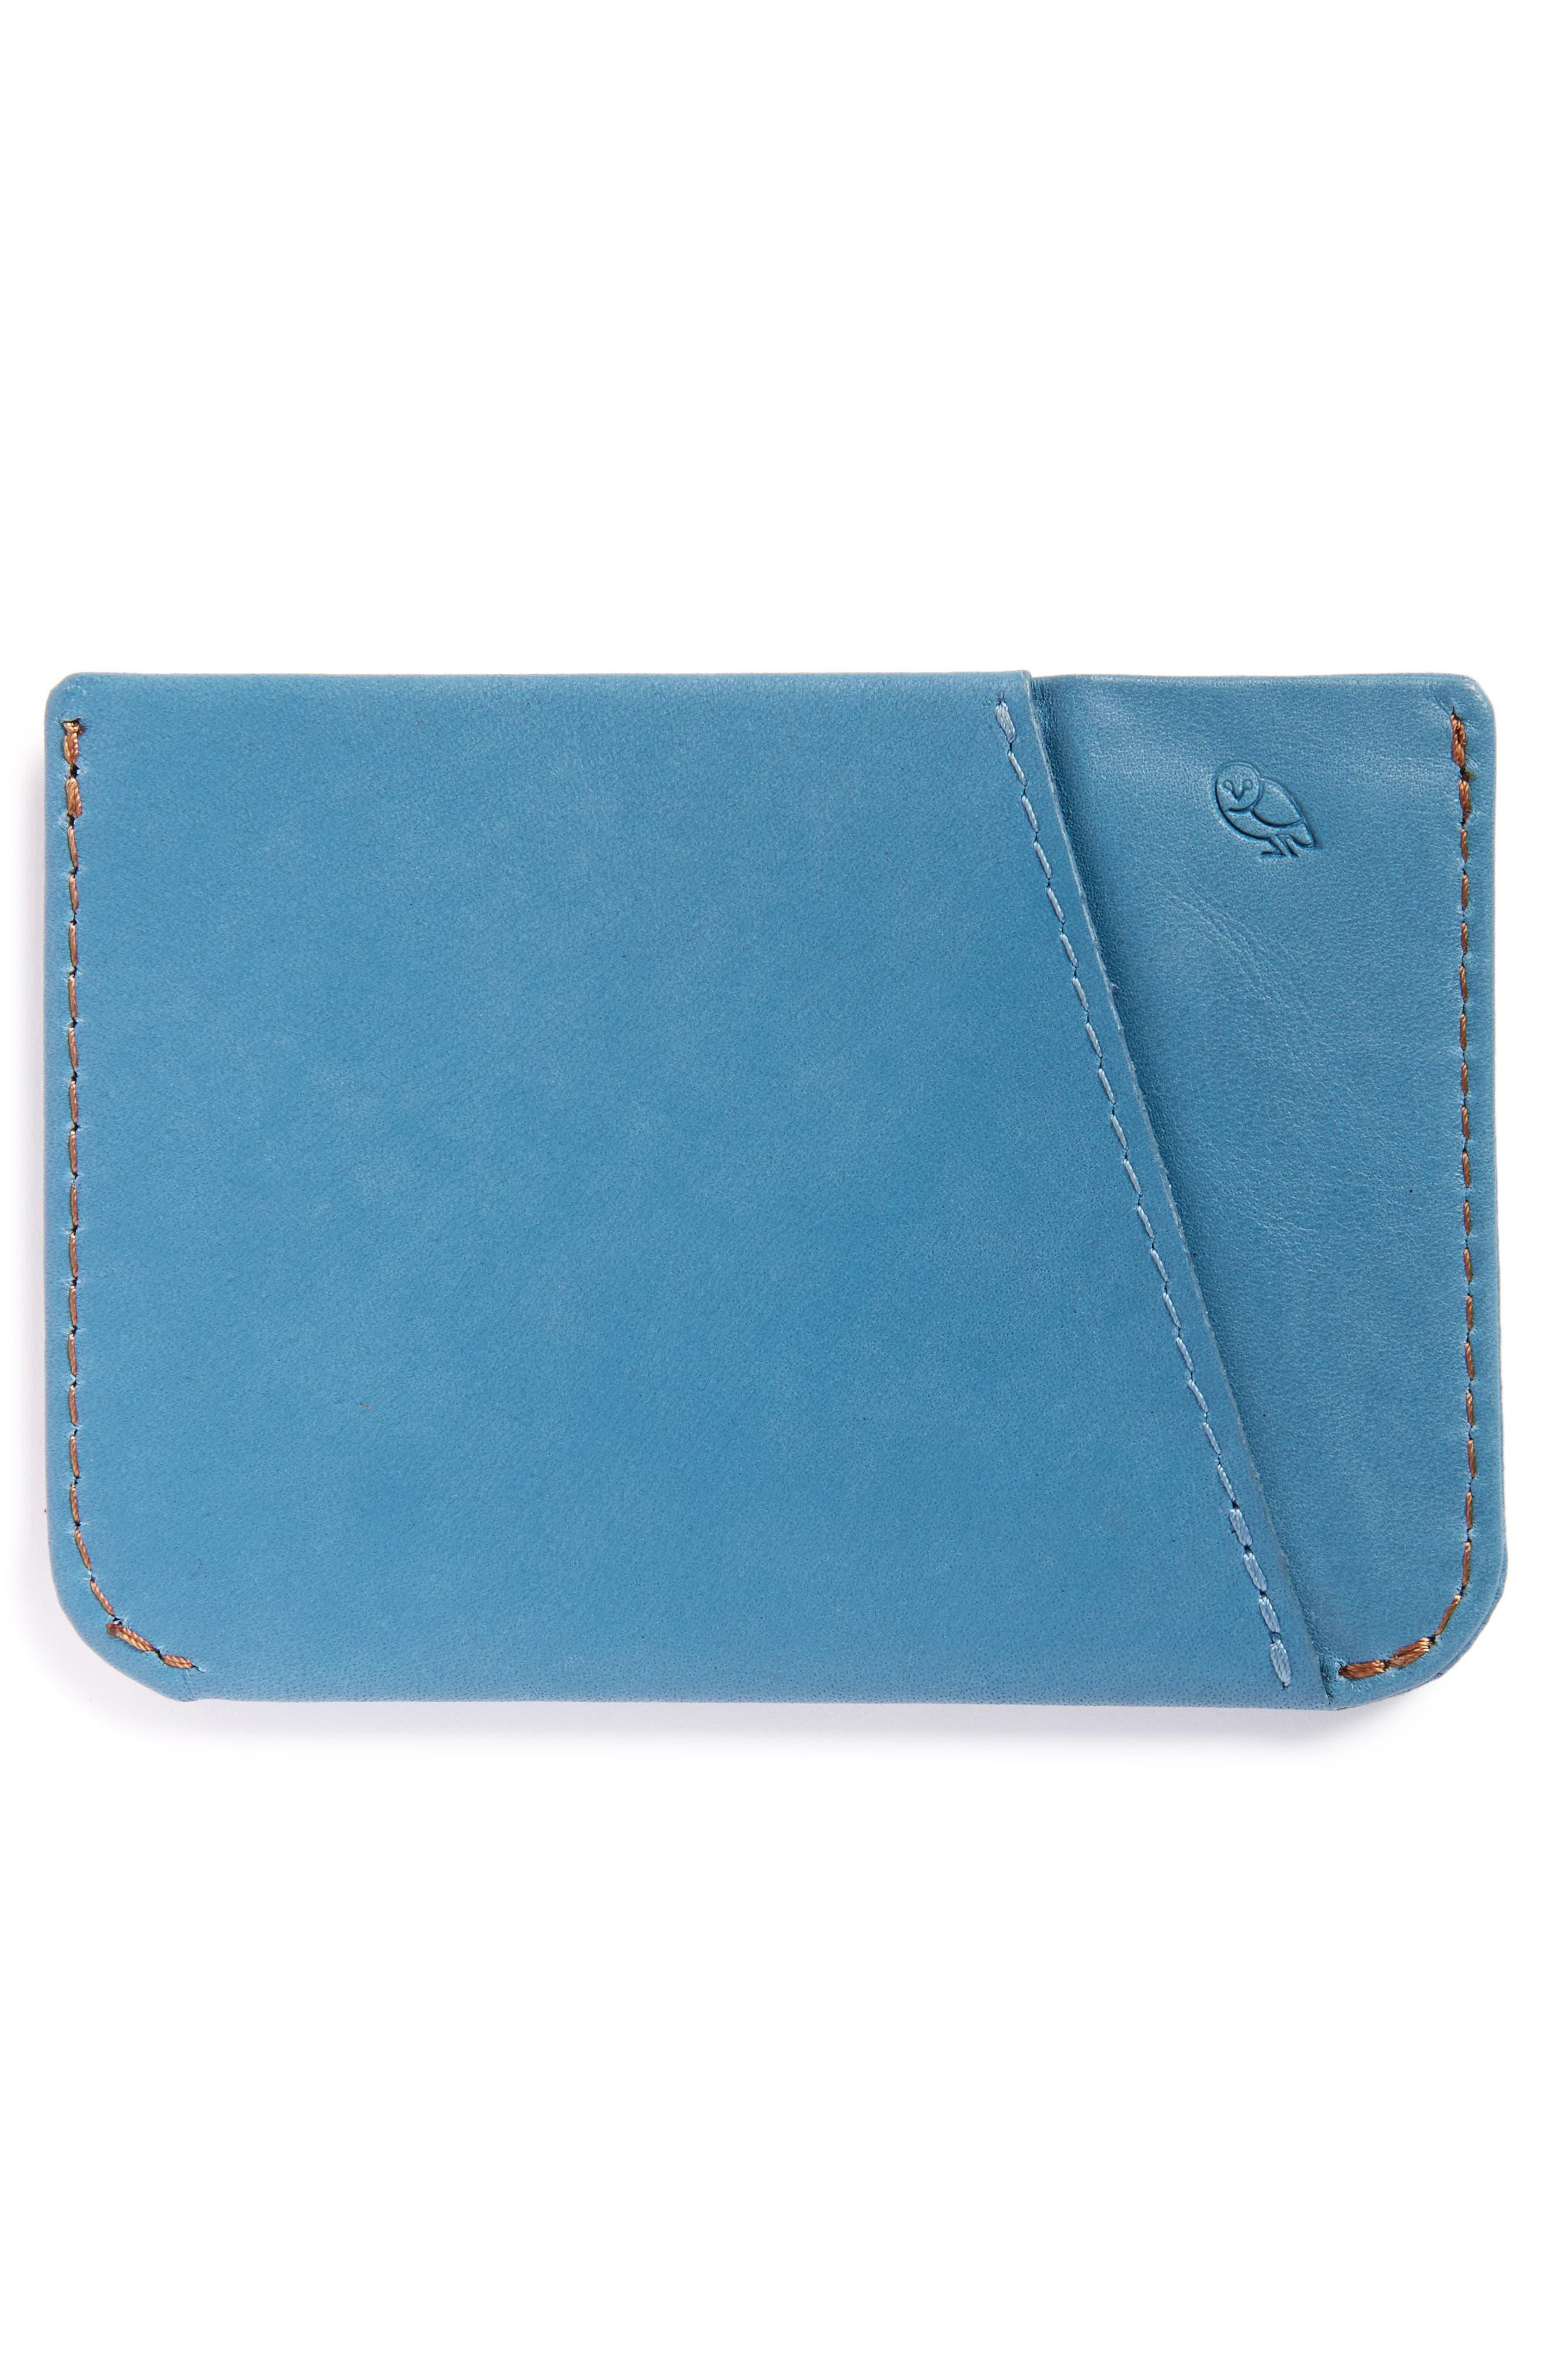 Micro Sleeve Card Case,                             Alternate thumbnail 8, color,